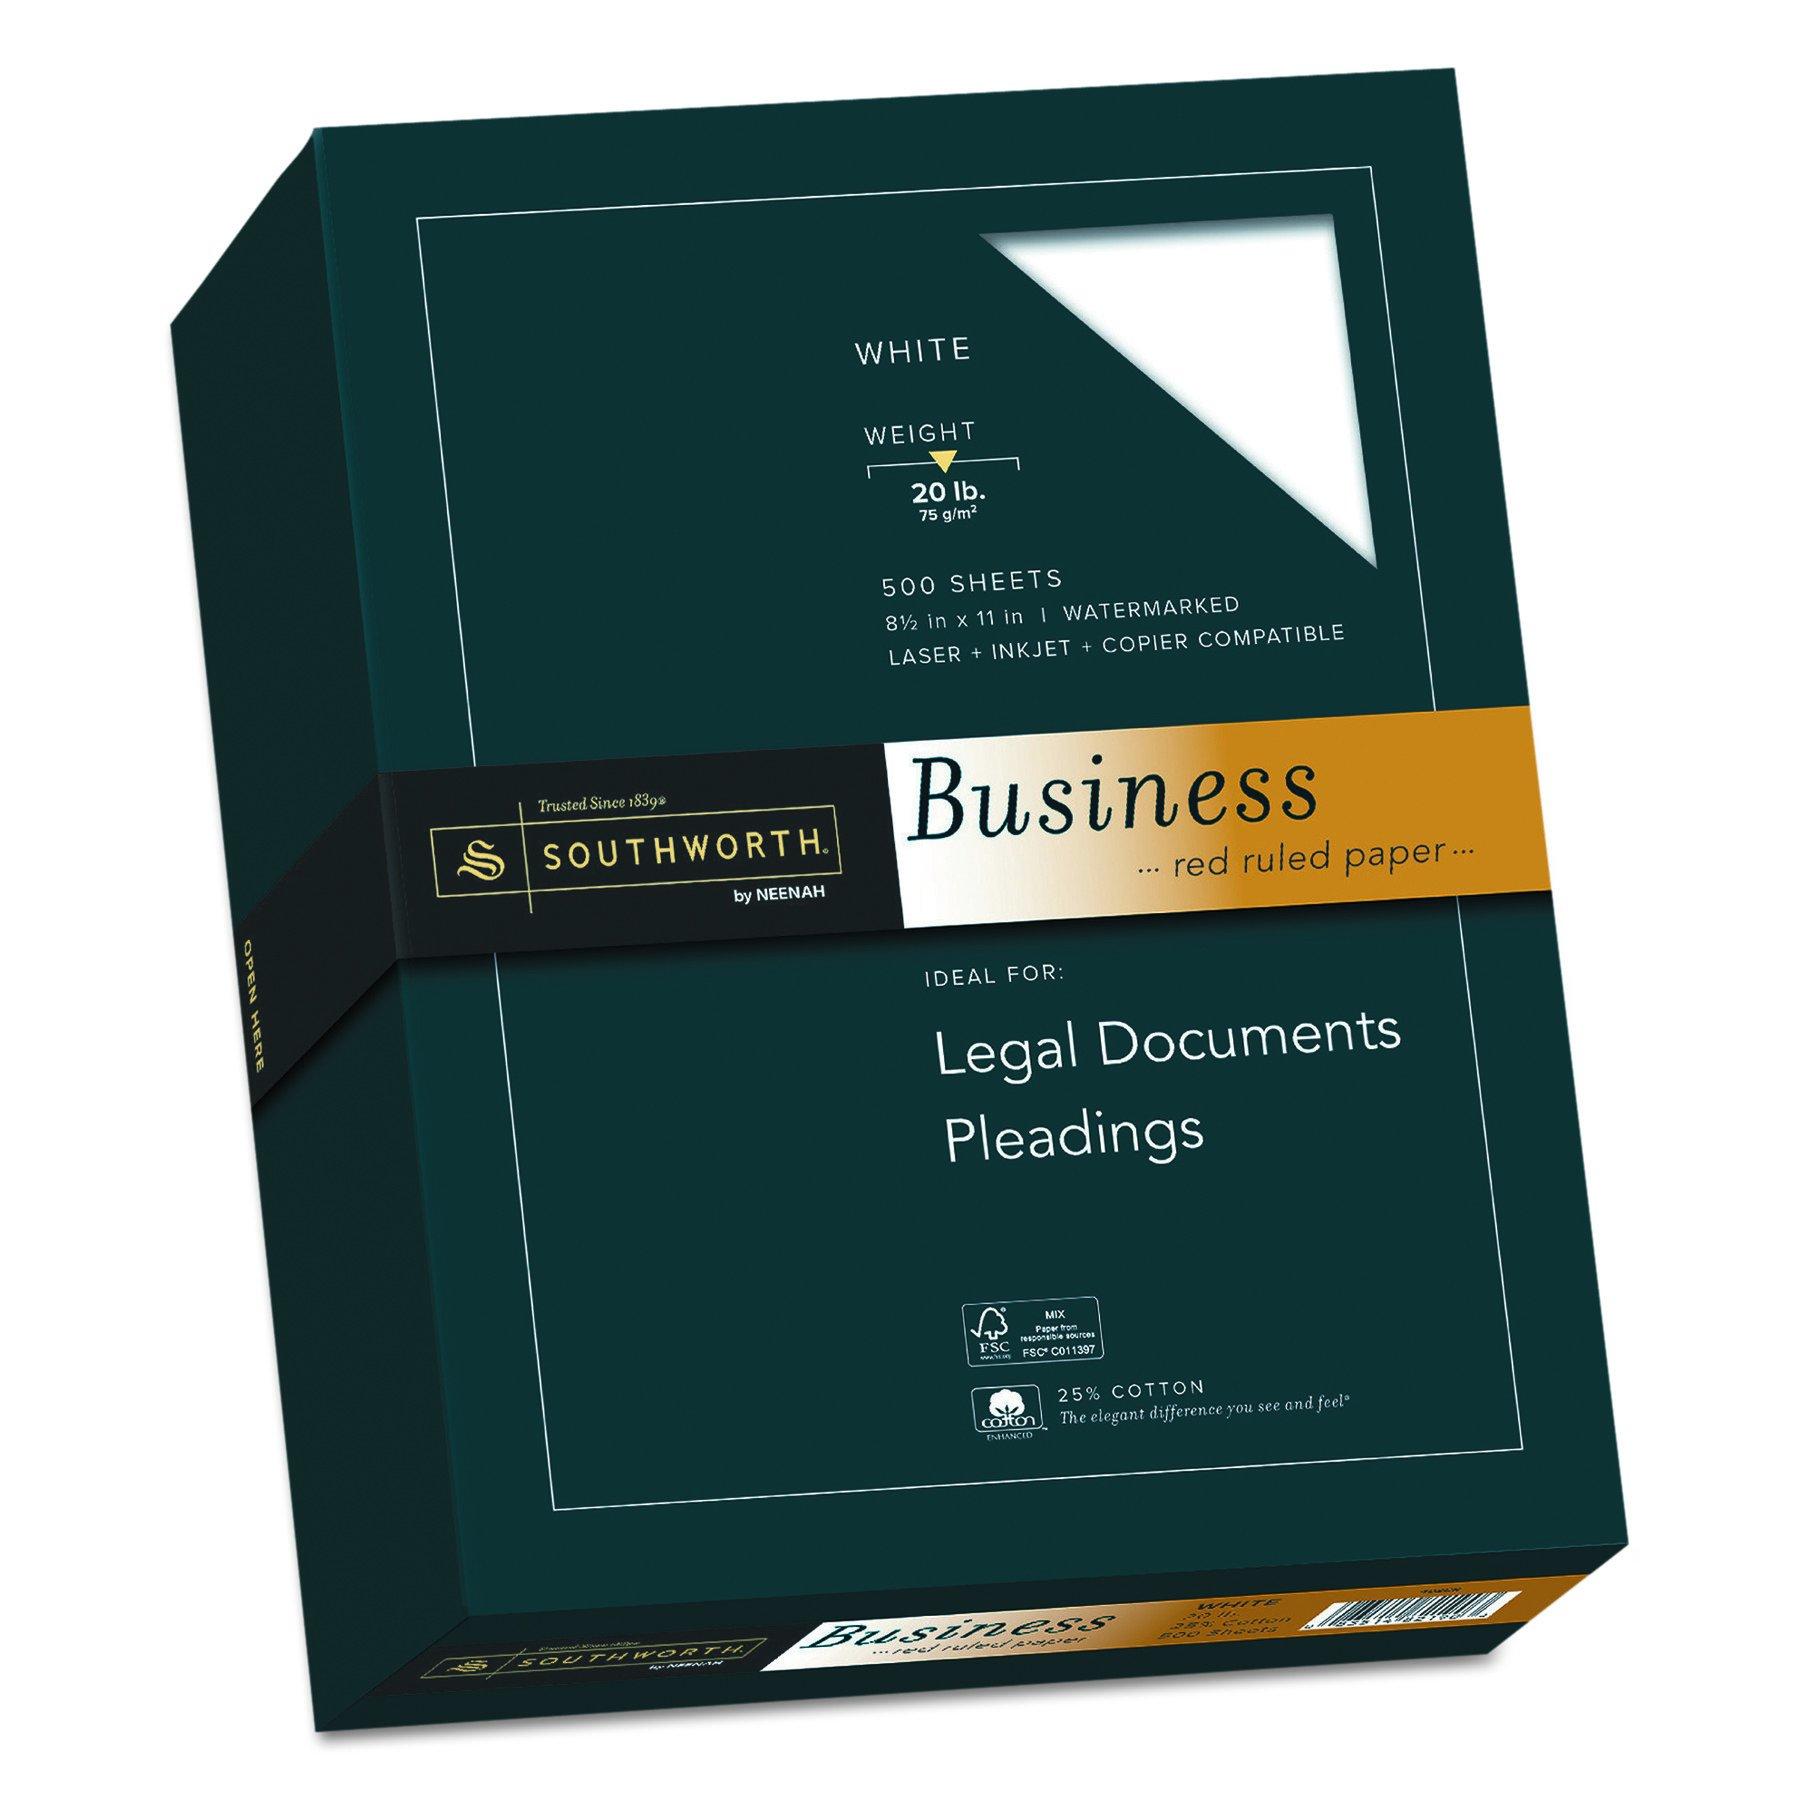 Southworth 25% Cotton Ruled Business Paper, 8.5 x 11 Inches, 20 lb, White, 500 per Box (403CR)